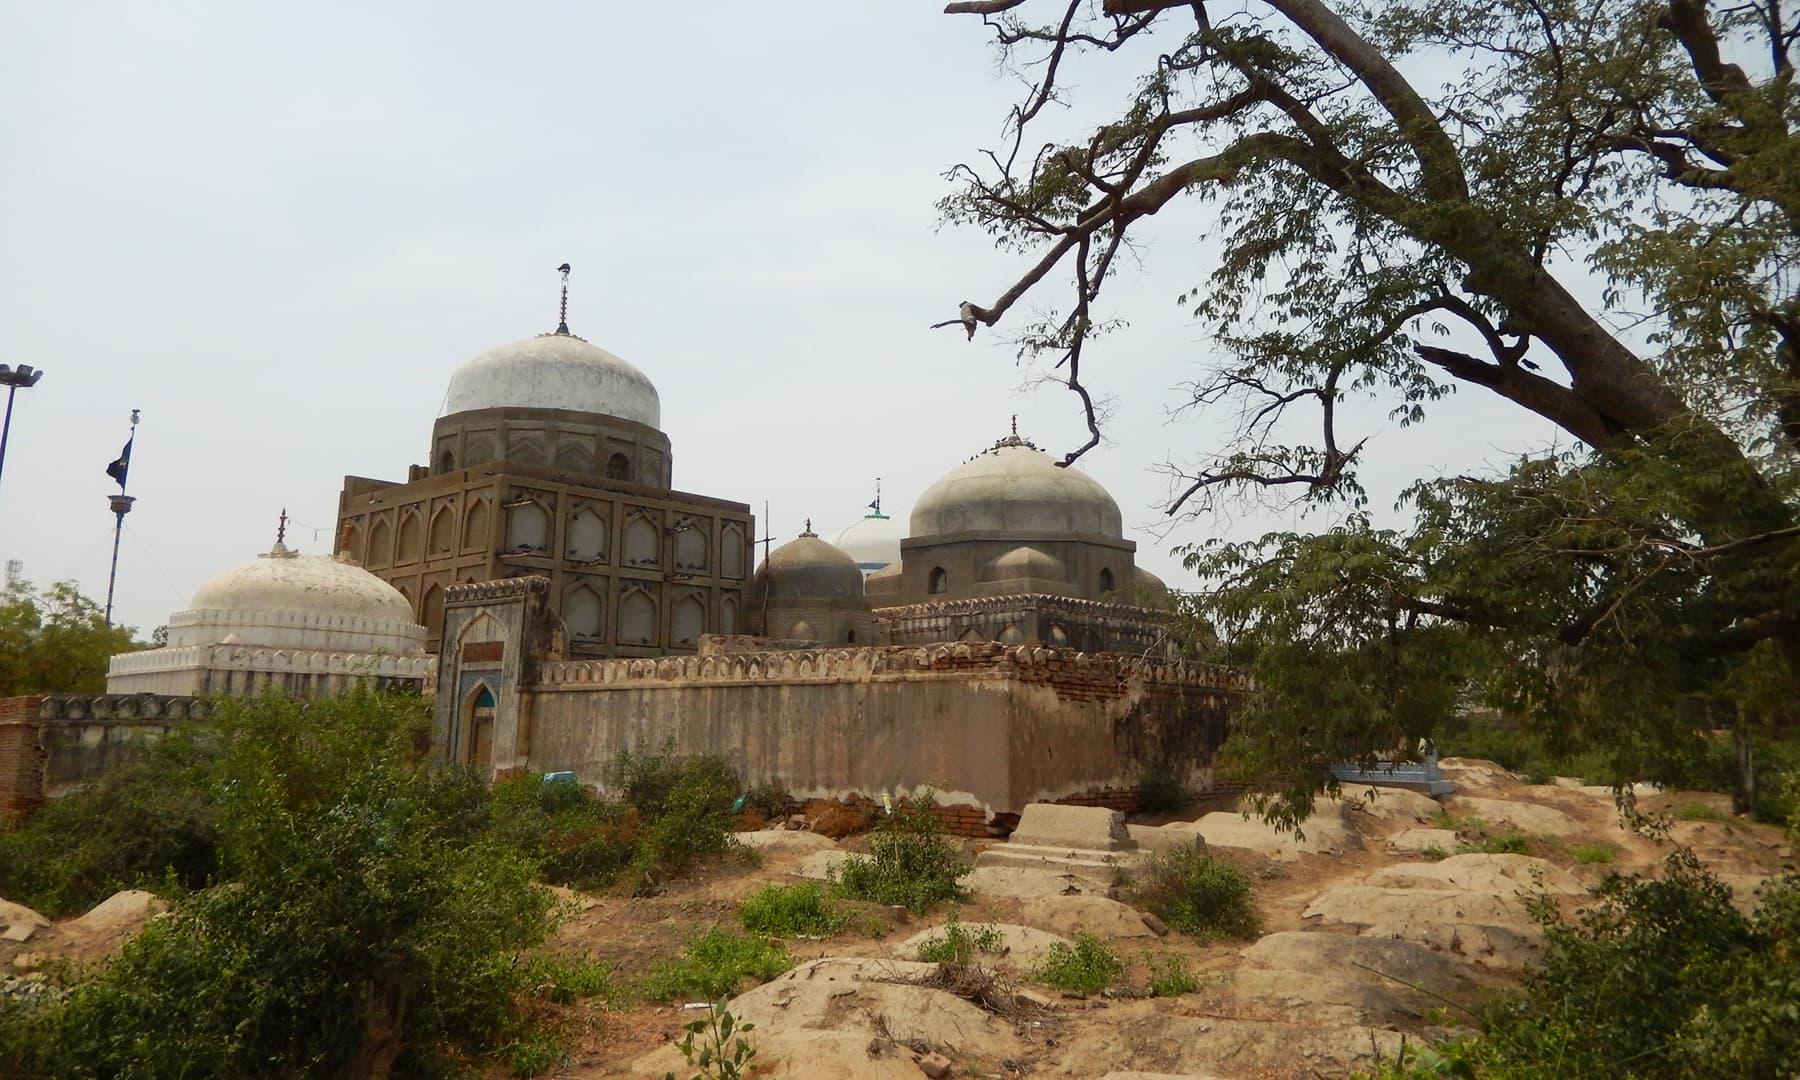 درگاہ کے پاس قدیم قبرستان—ابوبکر شیخ